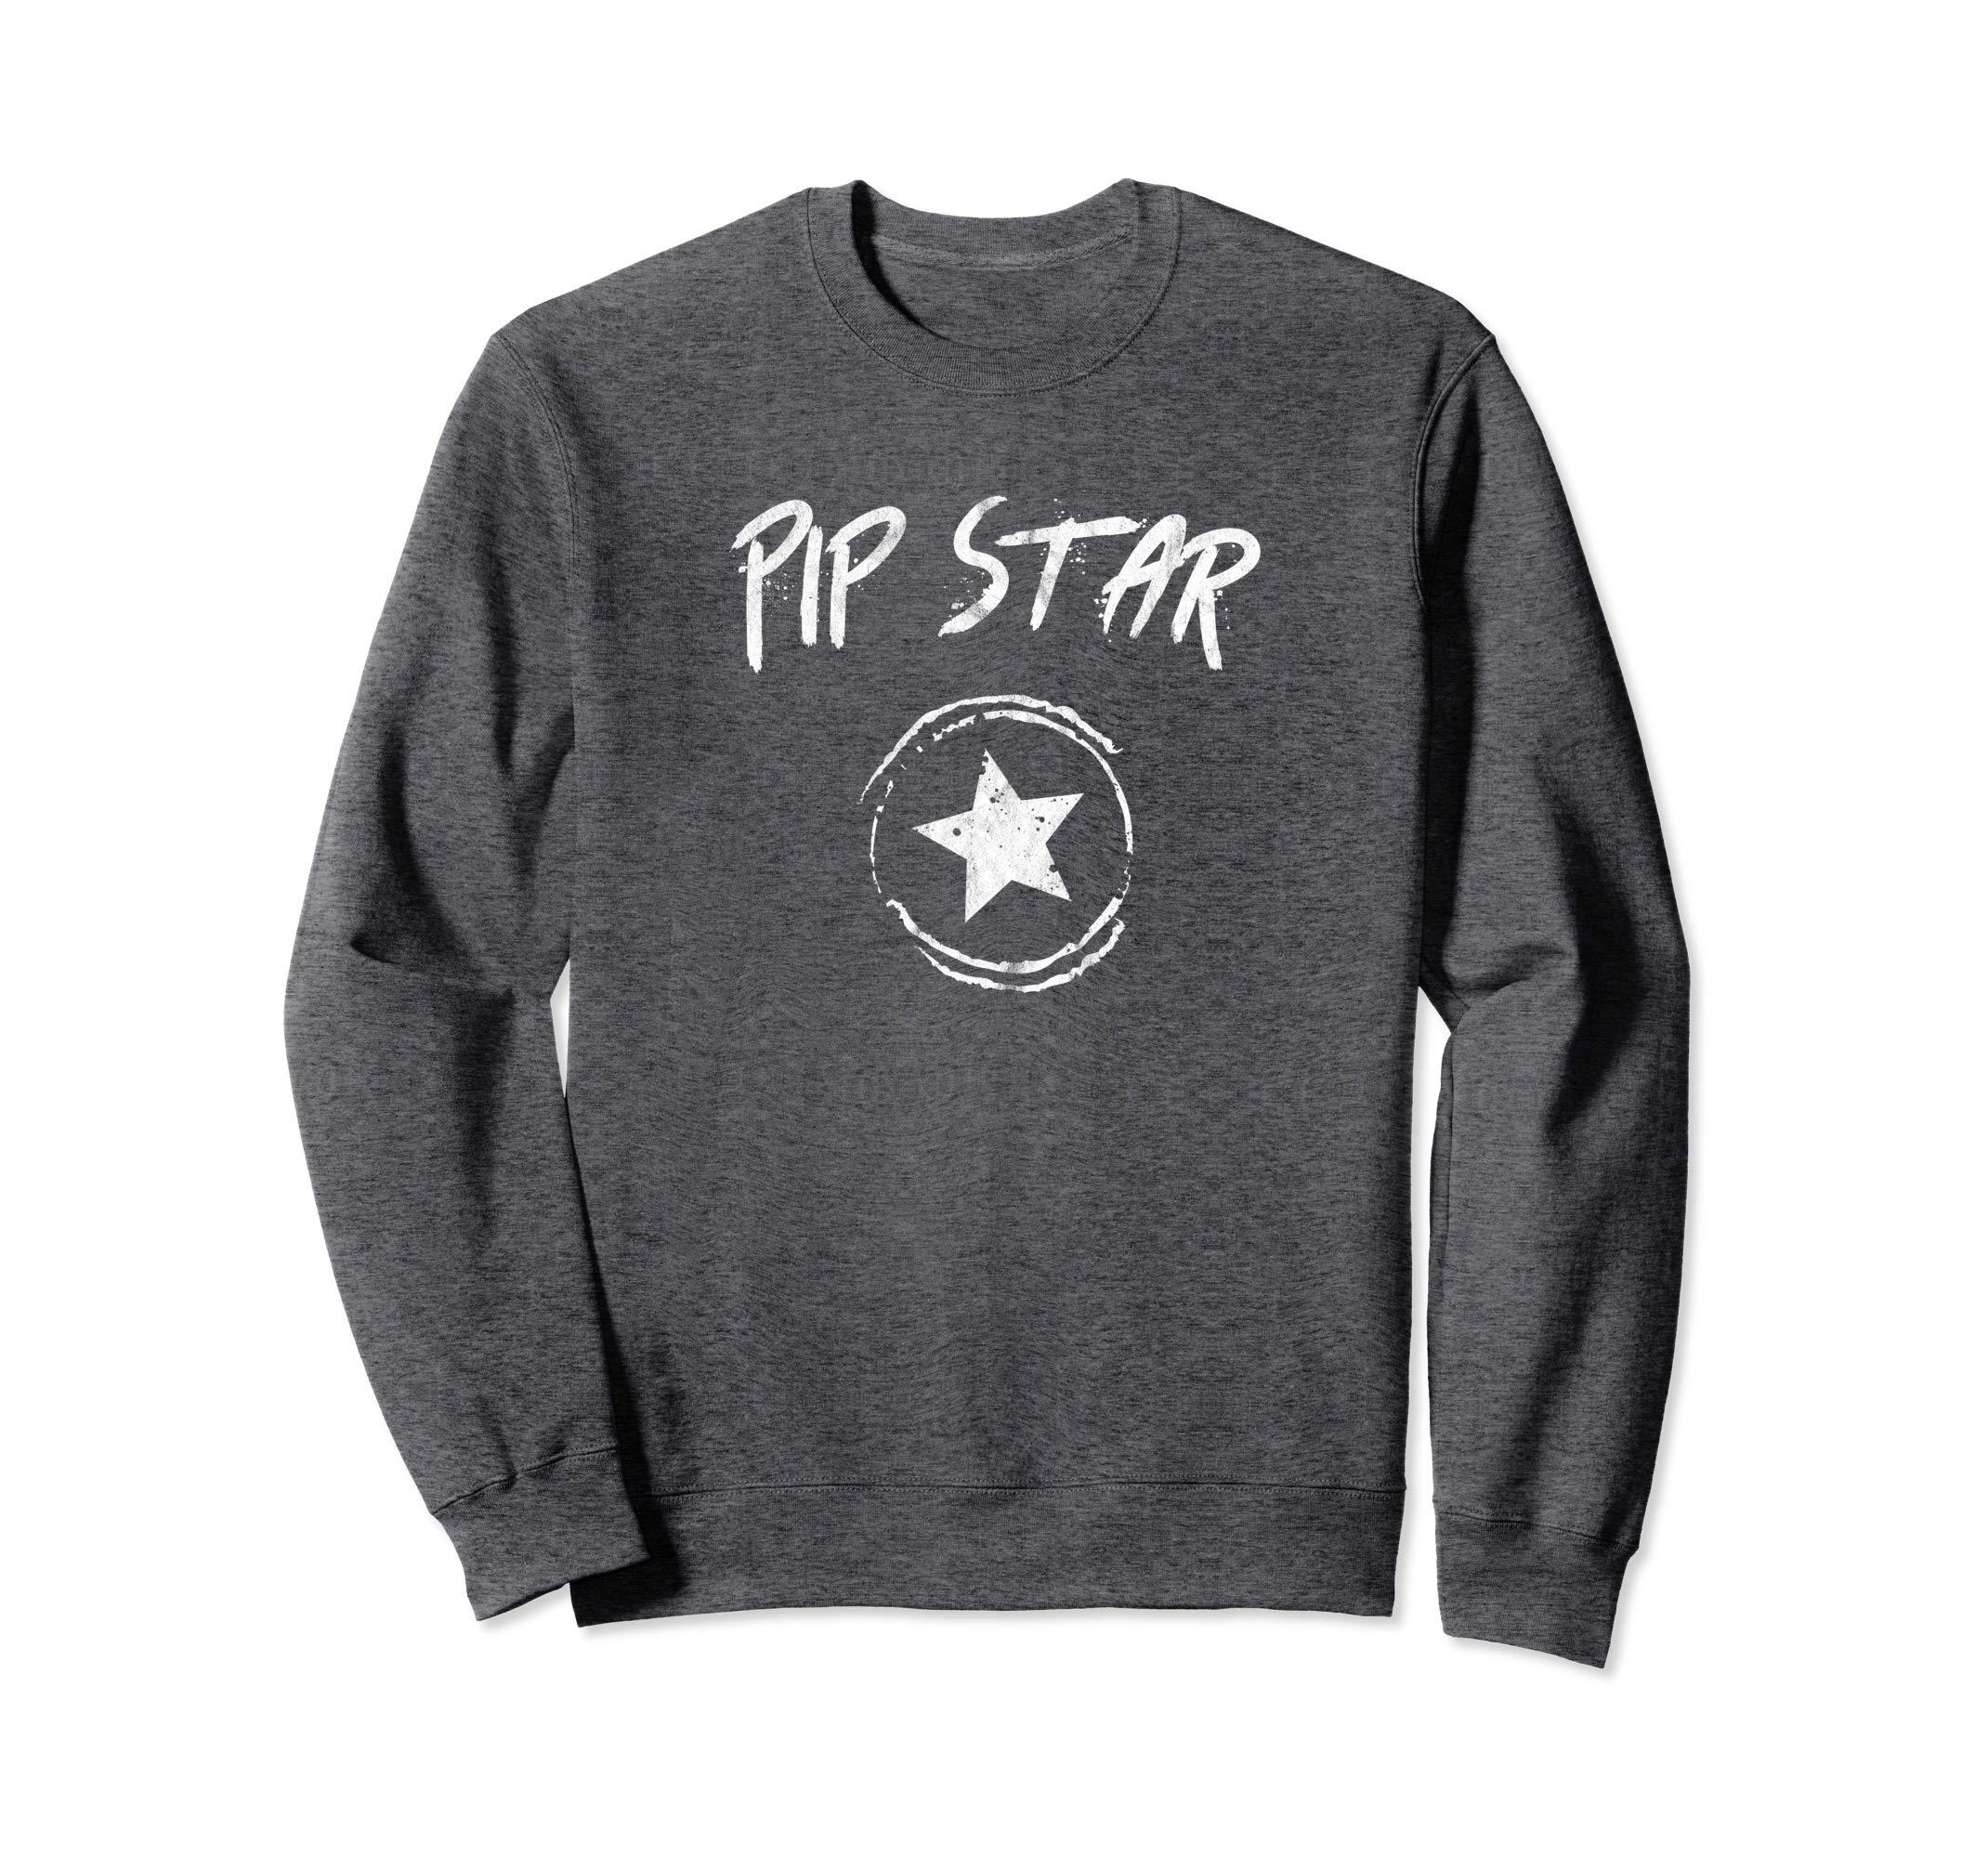 Pip Star sweatshirt